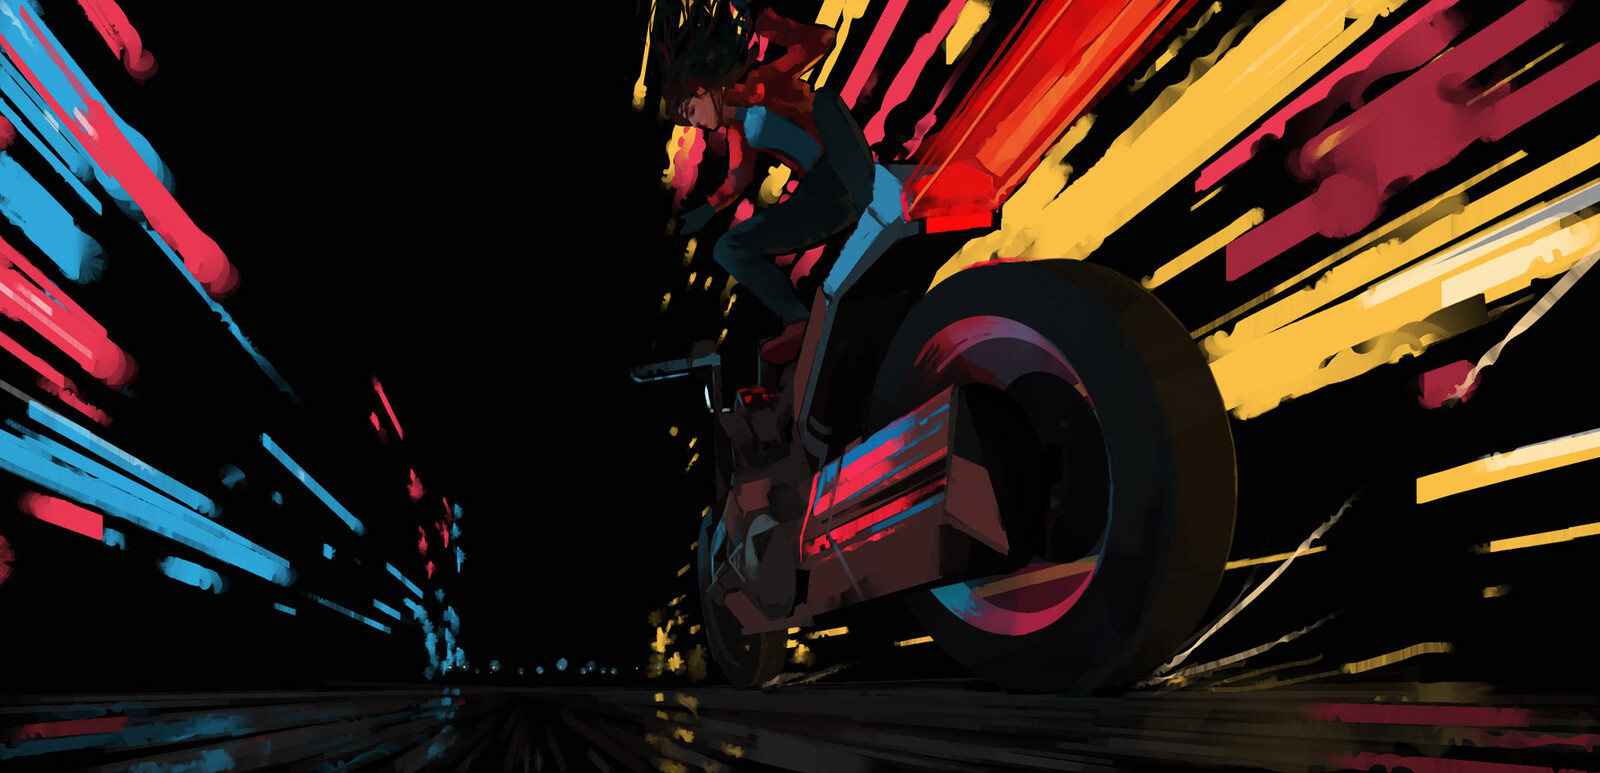 Inktober2019 - Day 28 - Ride